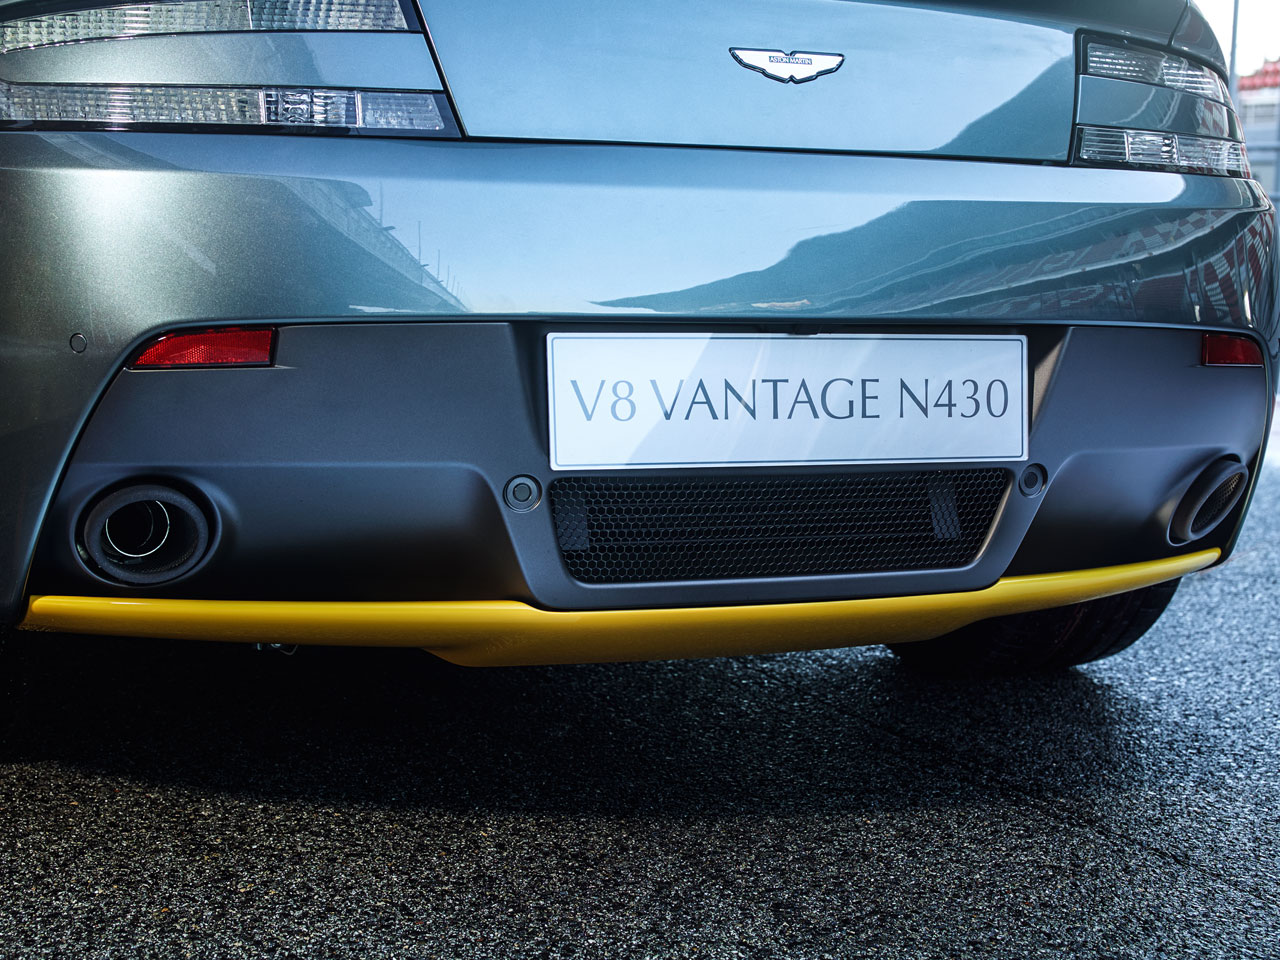 Aston Martin V8 Vantage N430 detail